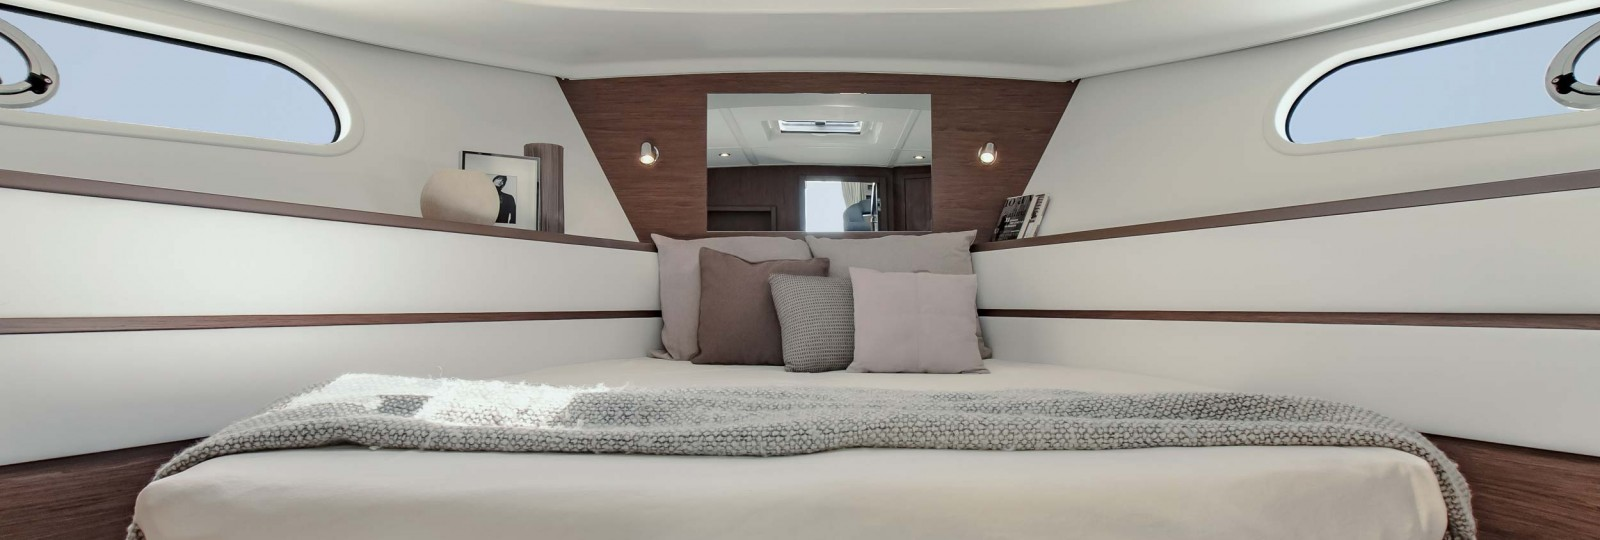 Beneteau Swift Trawler 44 master cabin